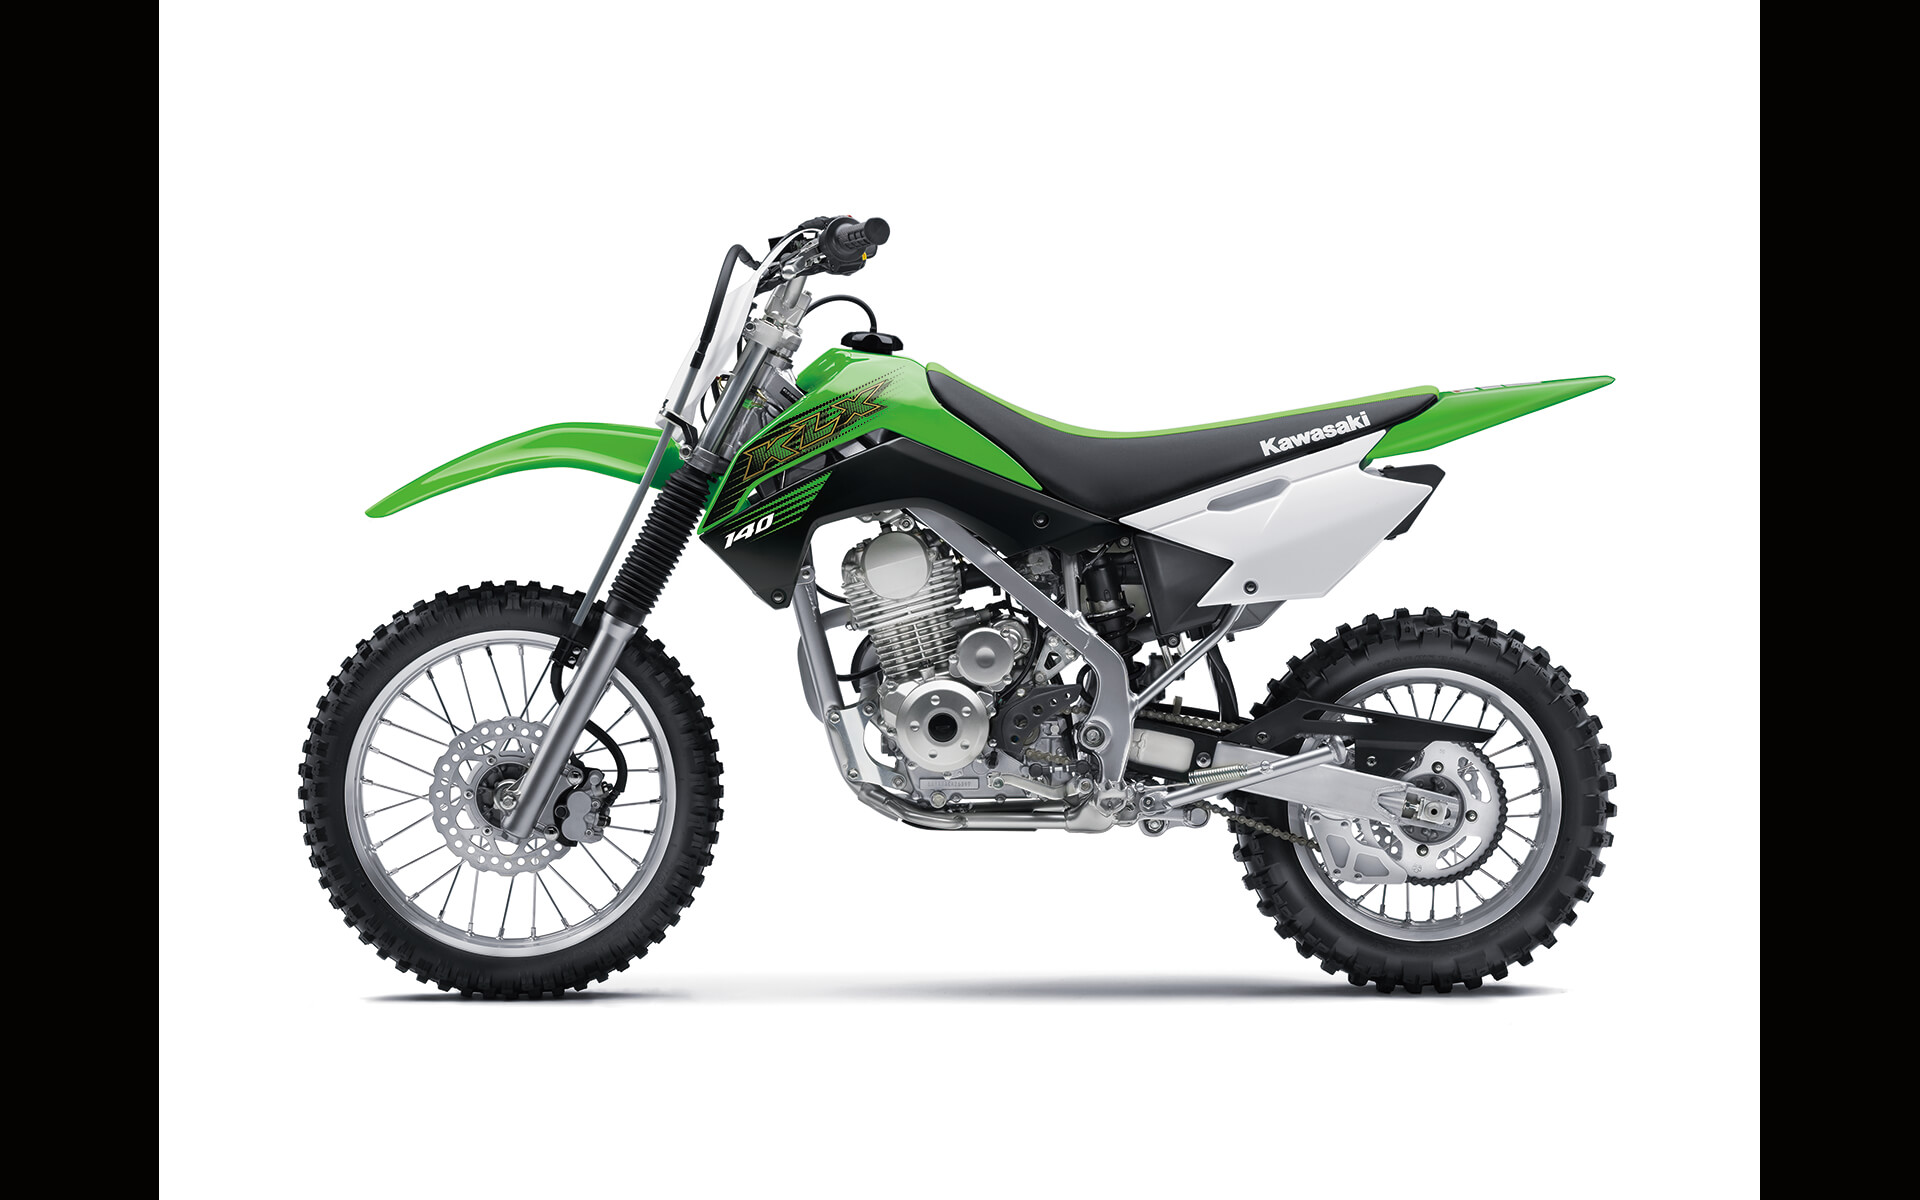 Klx 140 Motorcycle